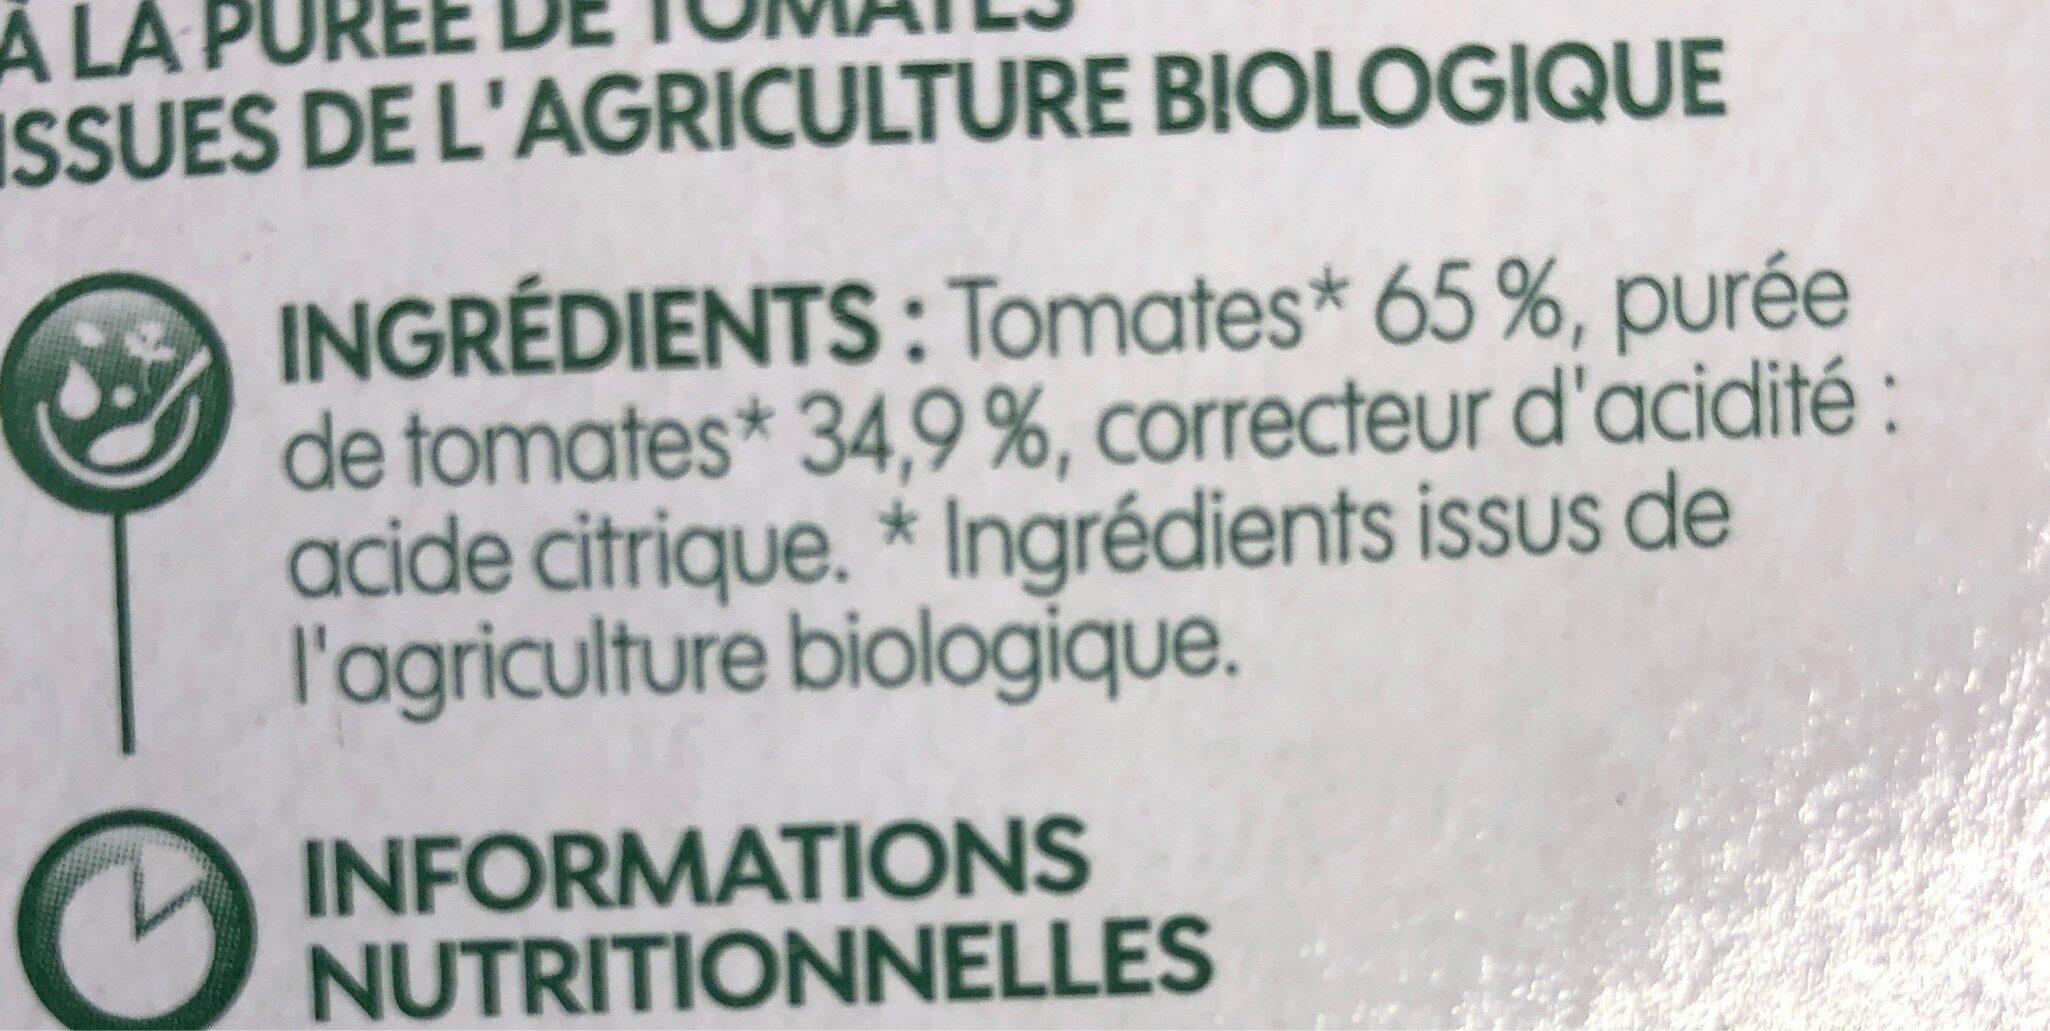 Pulpe de tomates en des bio - Ingrédients